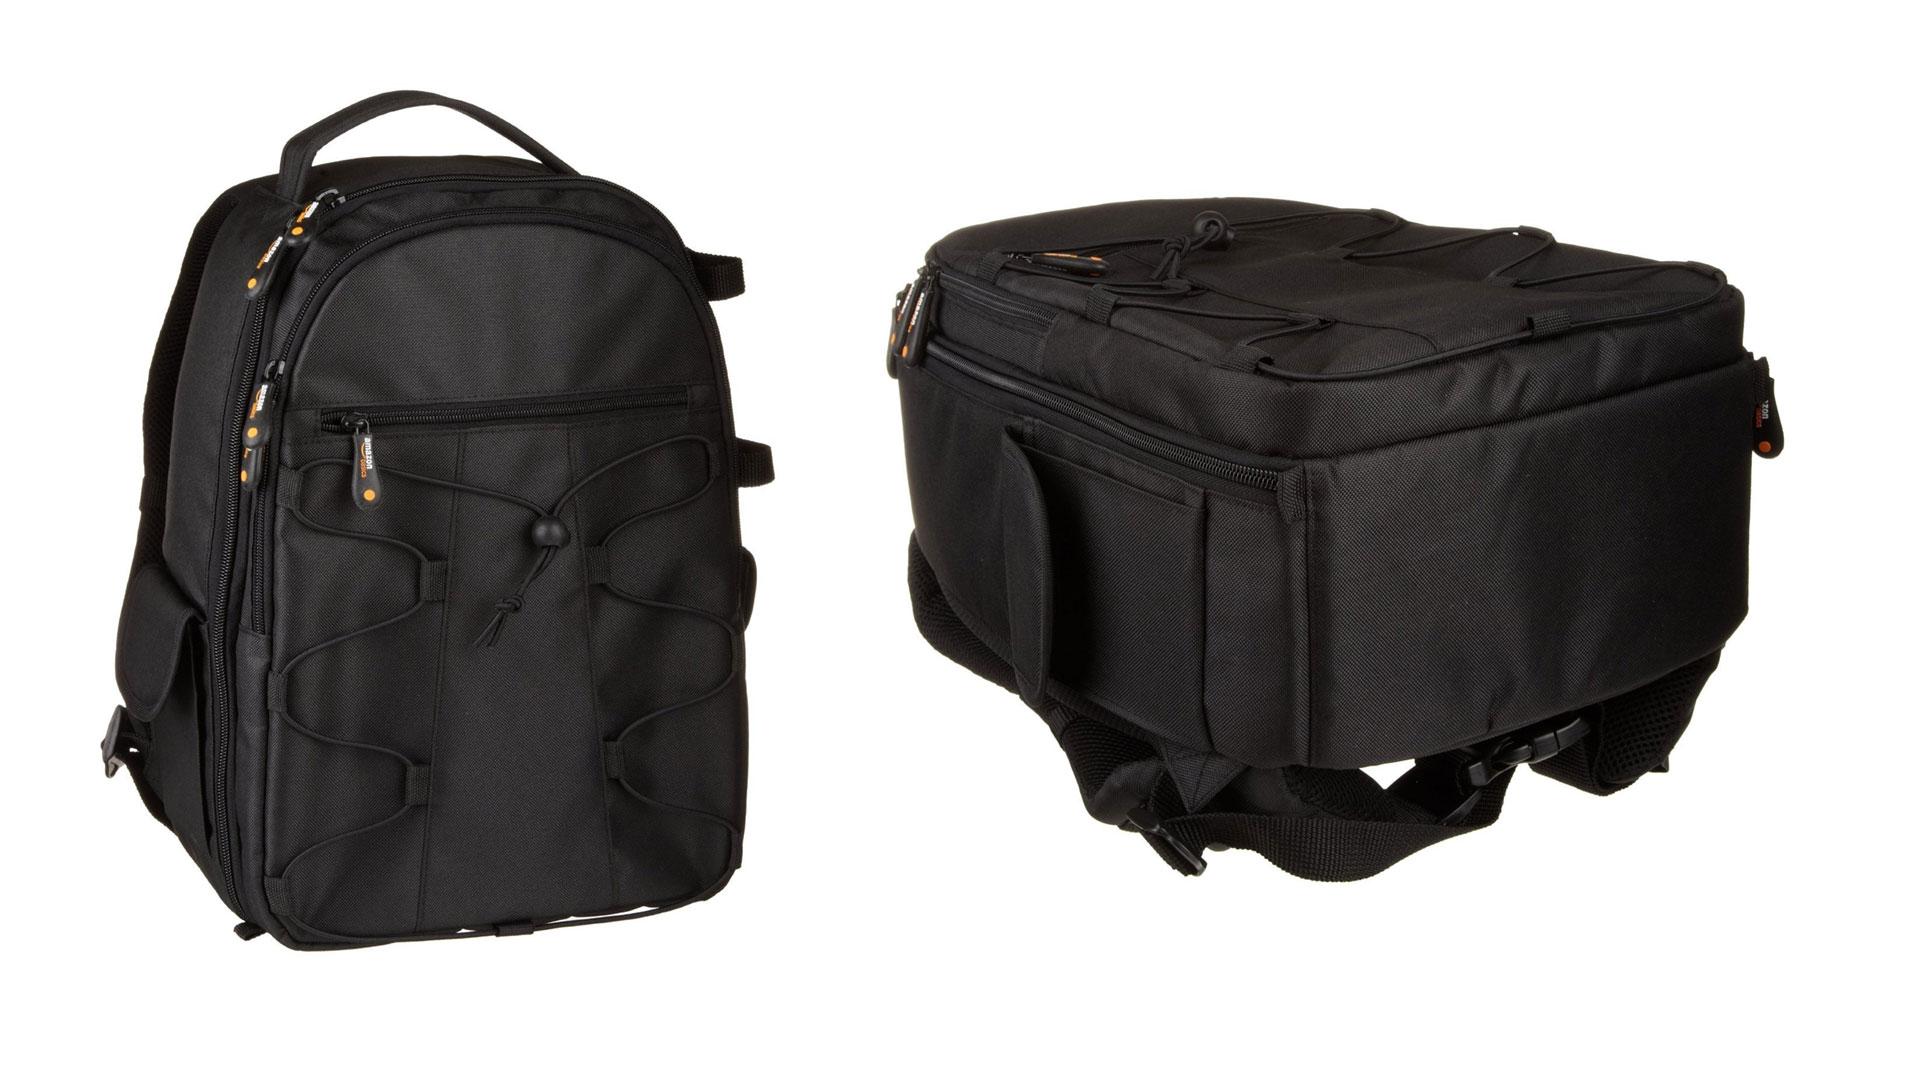 amazon basics camera bag, best dslr bag, best dslr camera bag, best dslr camera backpack